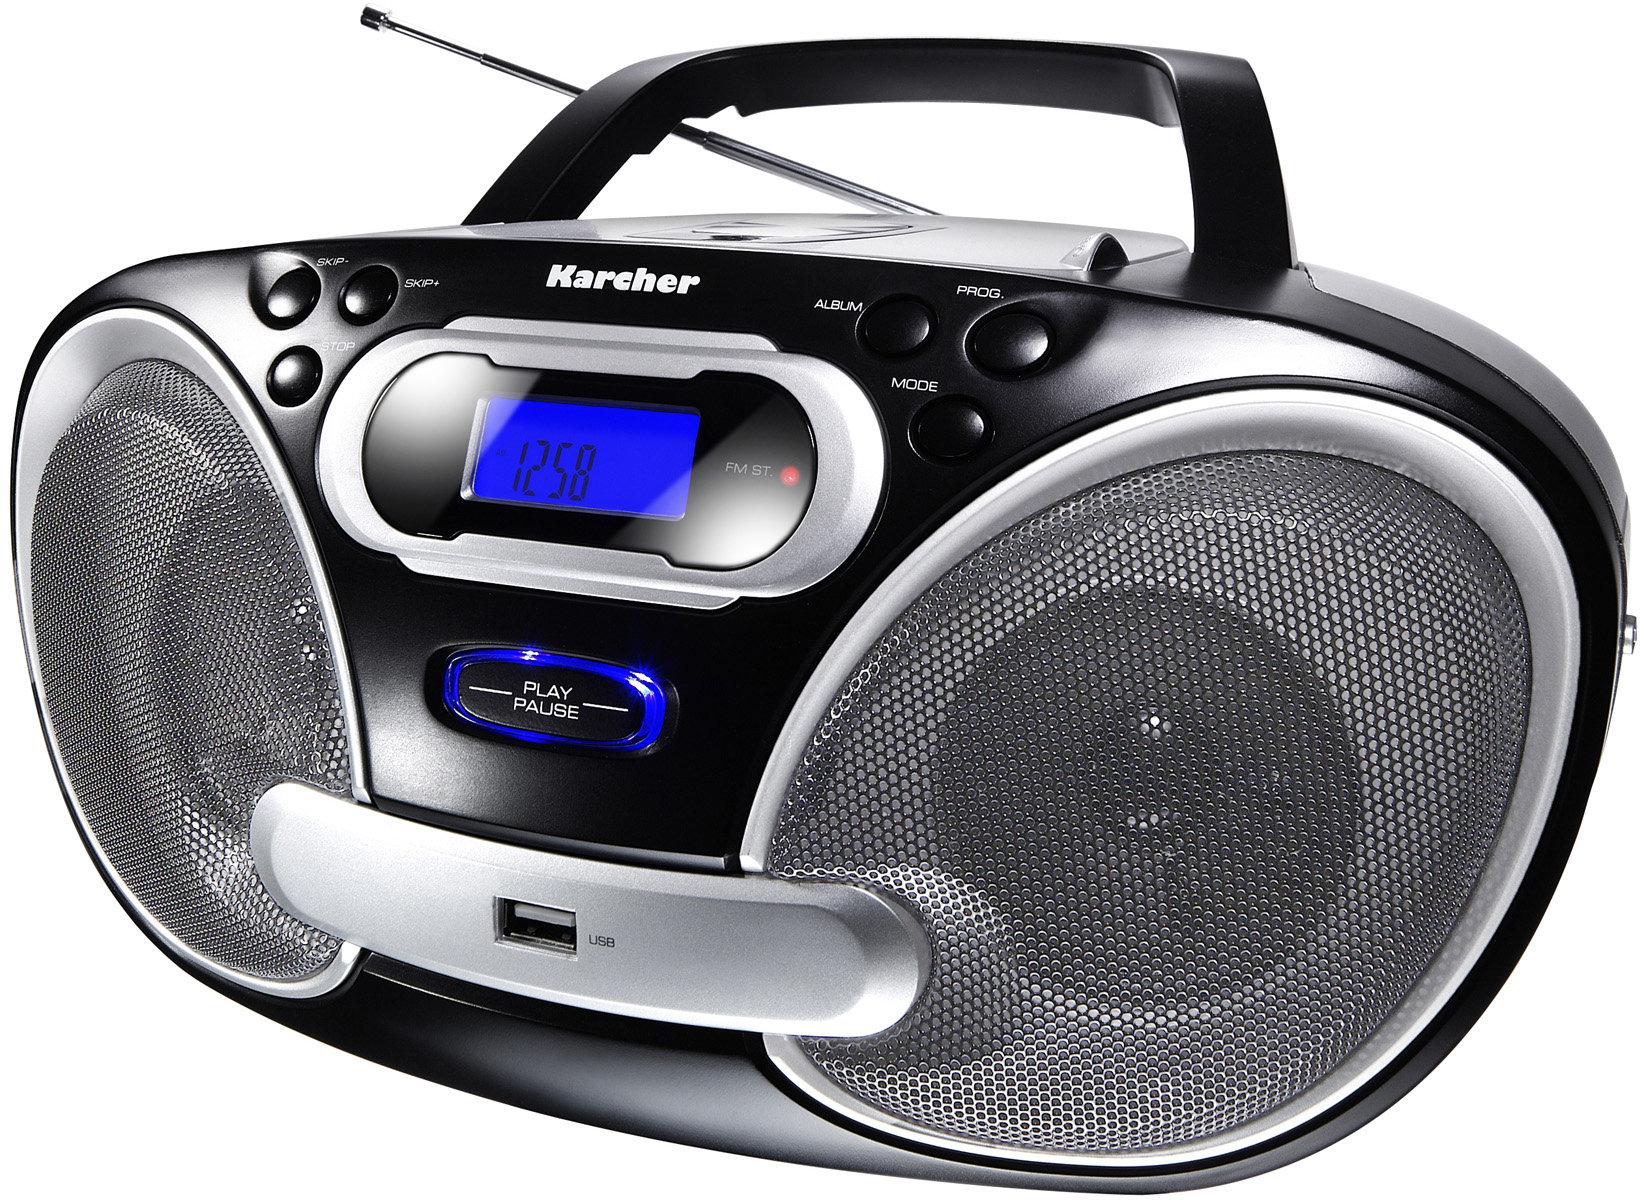 karcher rr5050 tragbares stereo radio cd mp3 player ukw radio usb 2 0 50 watt pmpo. Black Bedroom Furniture Sets. Home Design Ideas